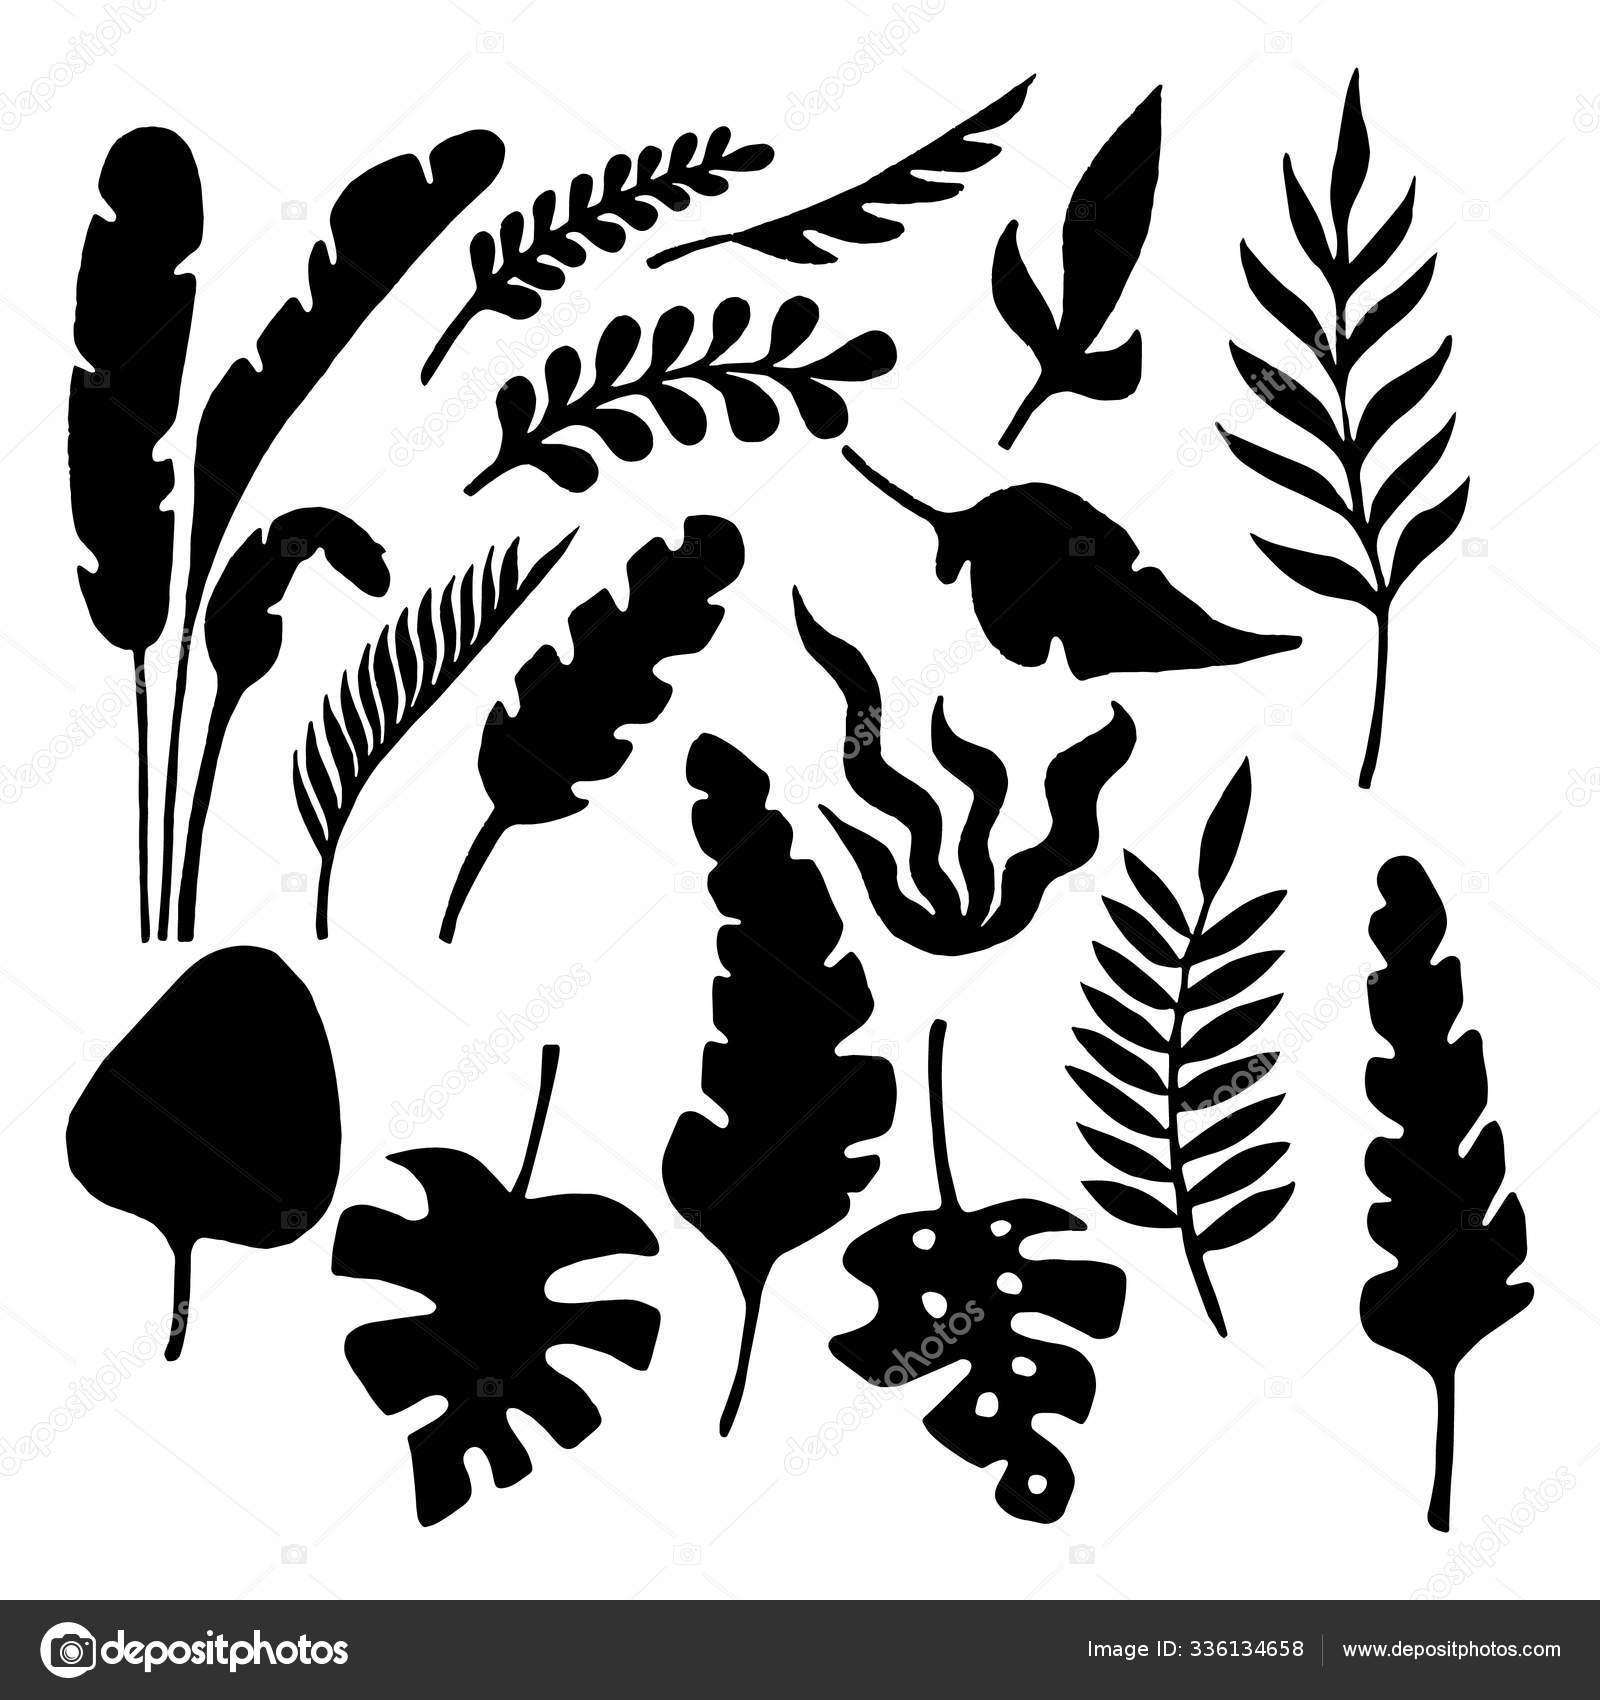 Set Black Jungle Leaves Jungle Leaves Wallpaper Fabric Prints Cards Stock Photo C Ozinge 336134658 Download 23,039 jungle leaves free vectors. https depositphotos com 336134658 stock photo set black jungle leaves jungle html